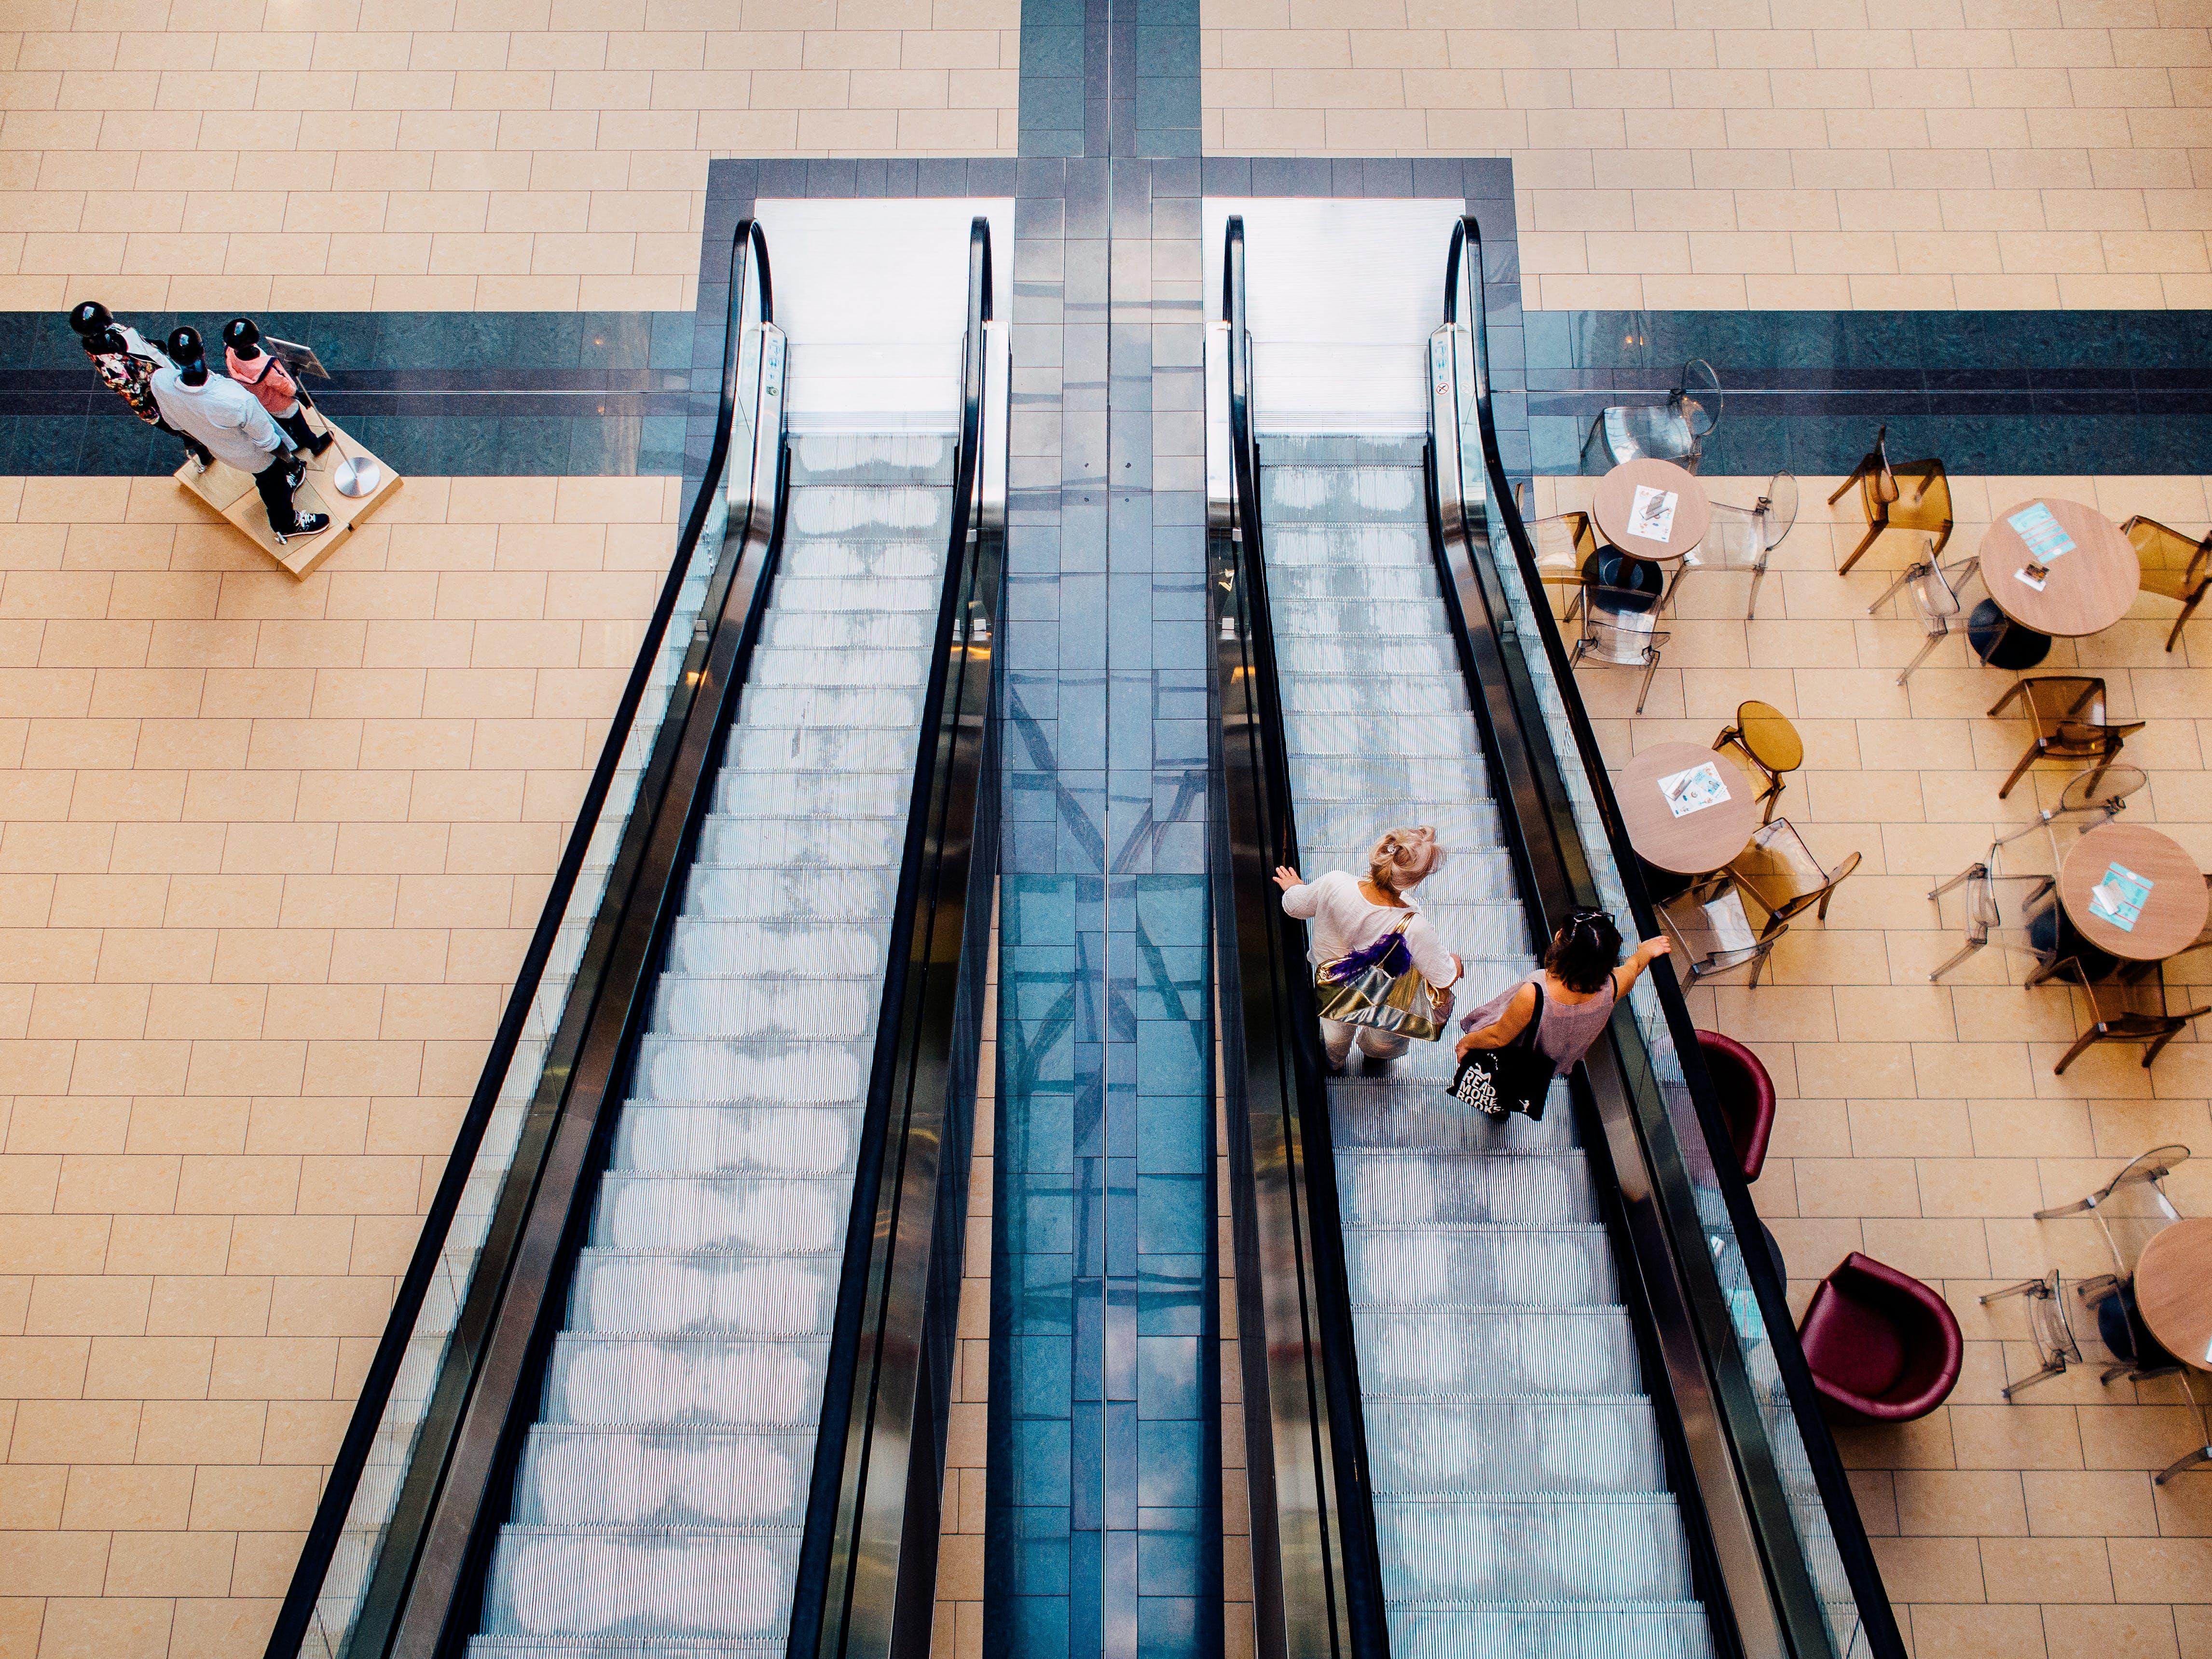 berbelanja, eskalator, manusia